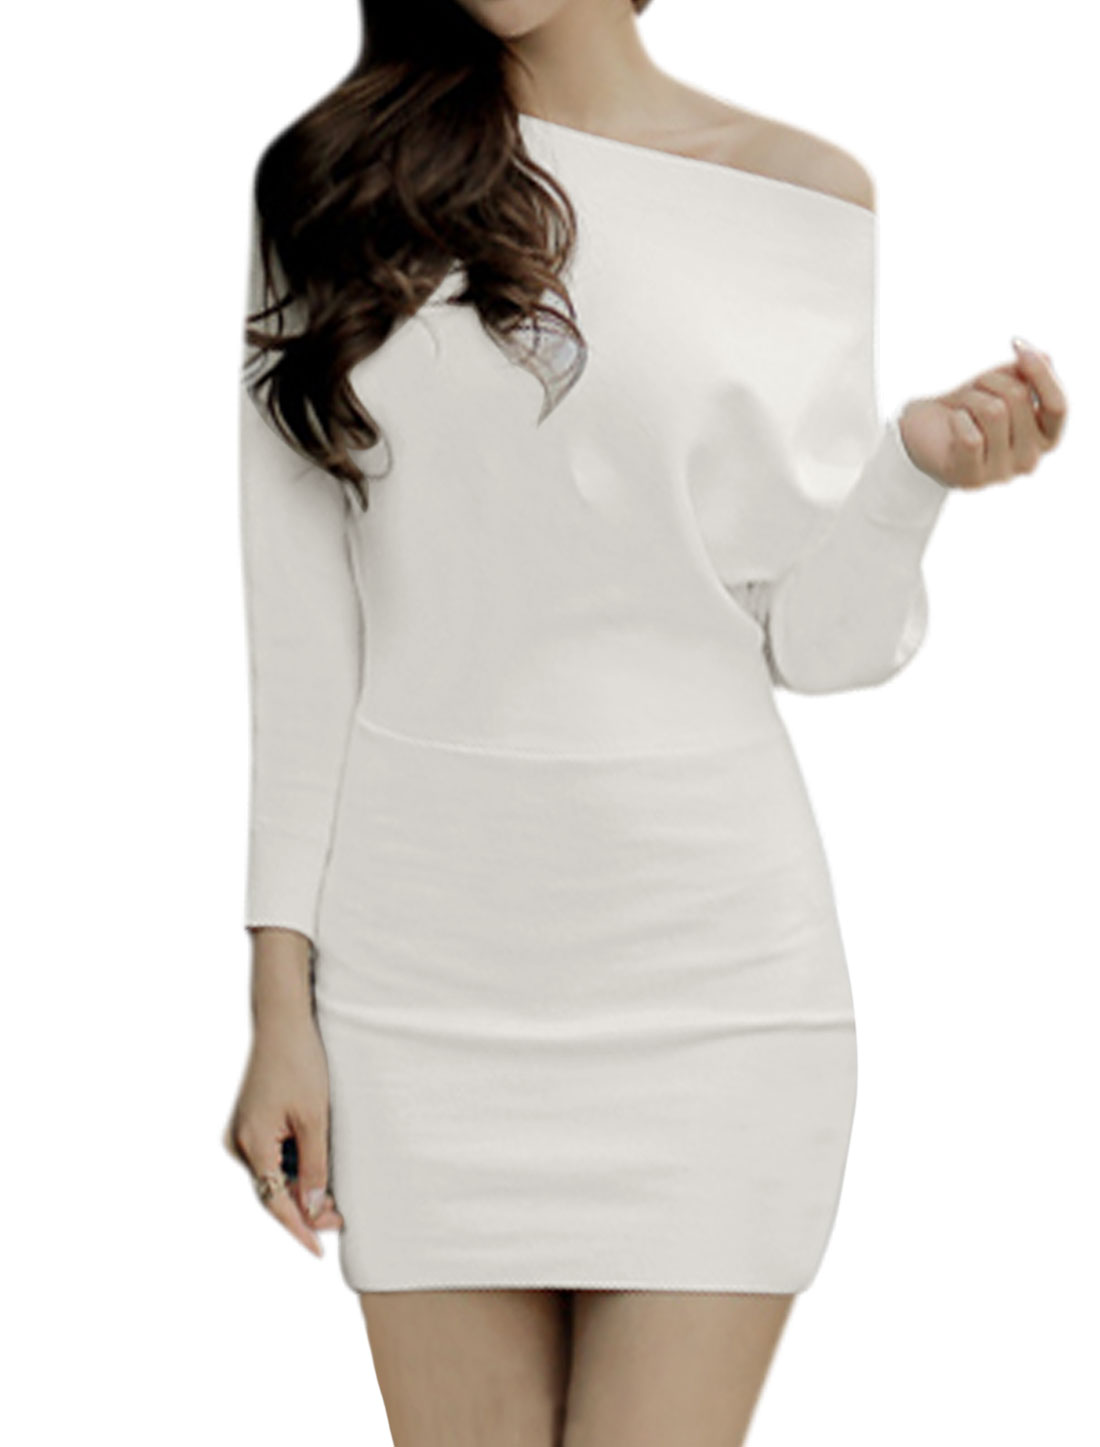 Women Boat Neck Batwing Sleeves Mini Blouson Dress White S